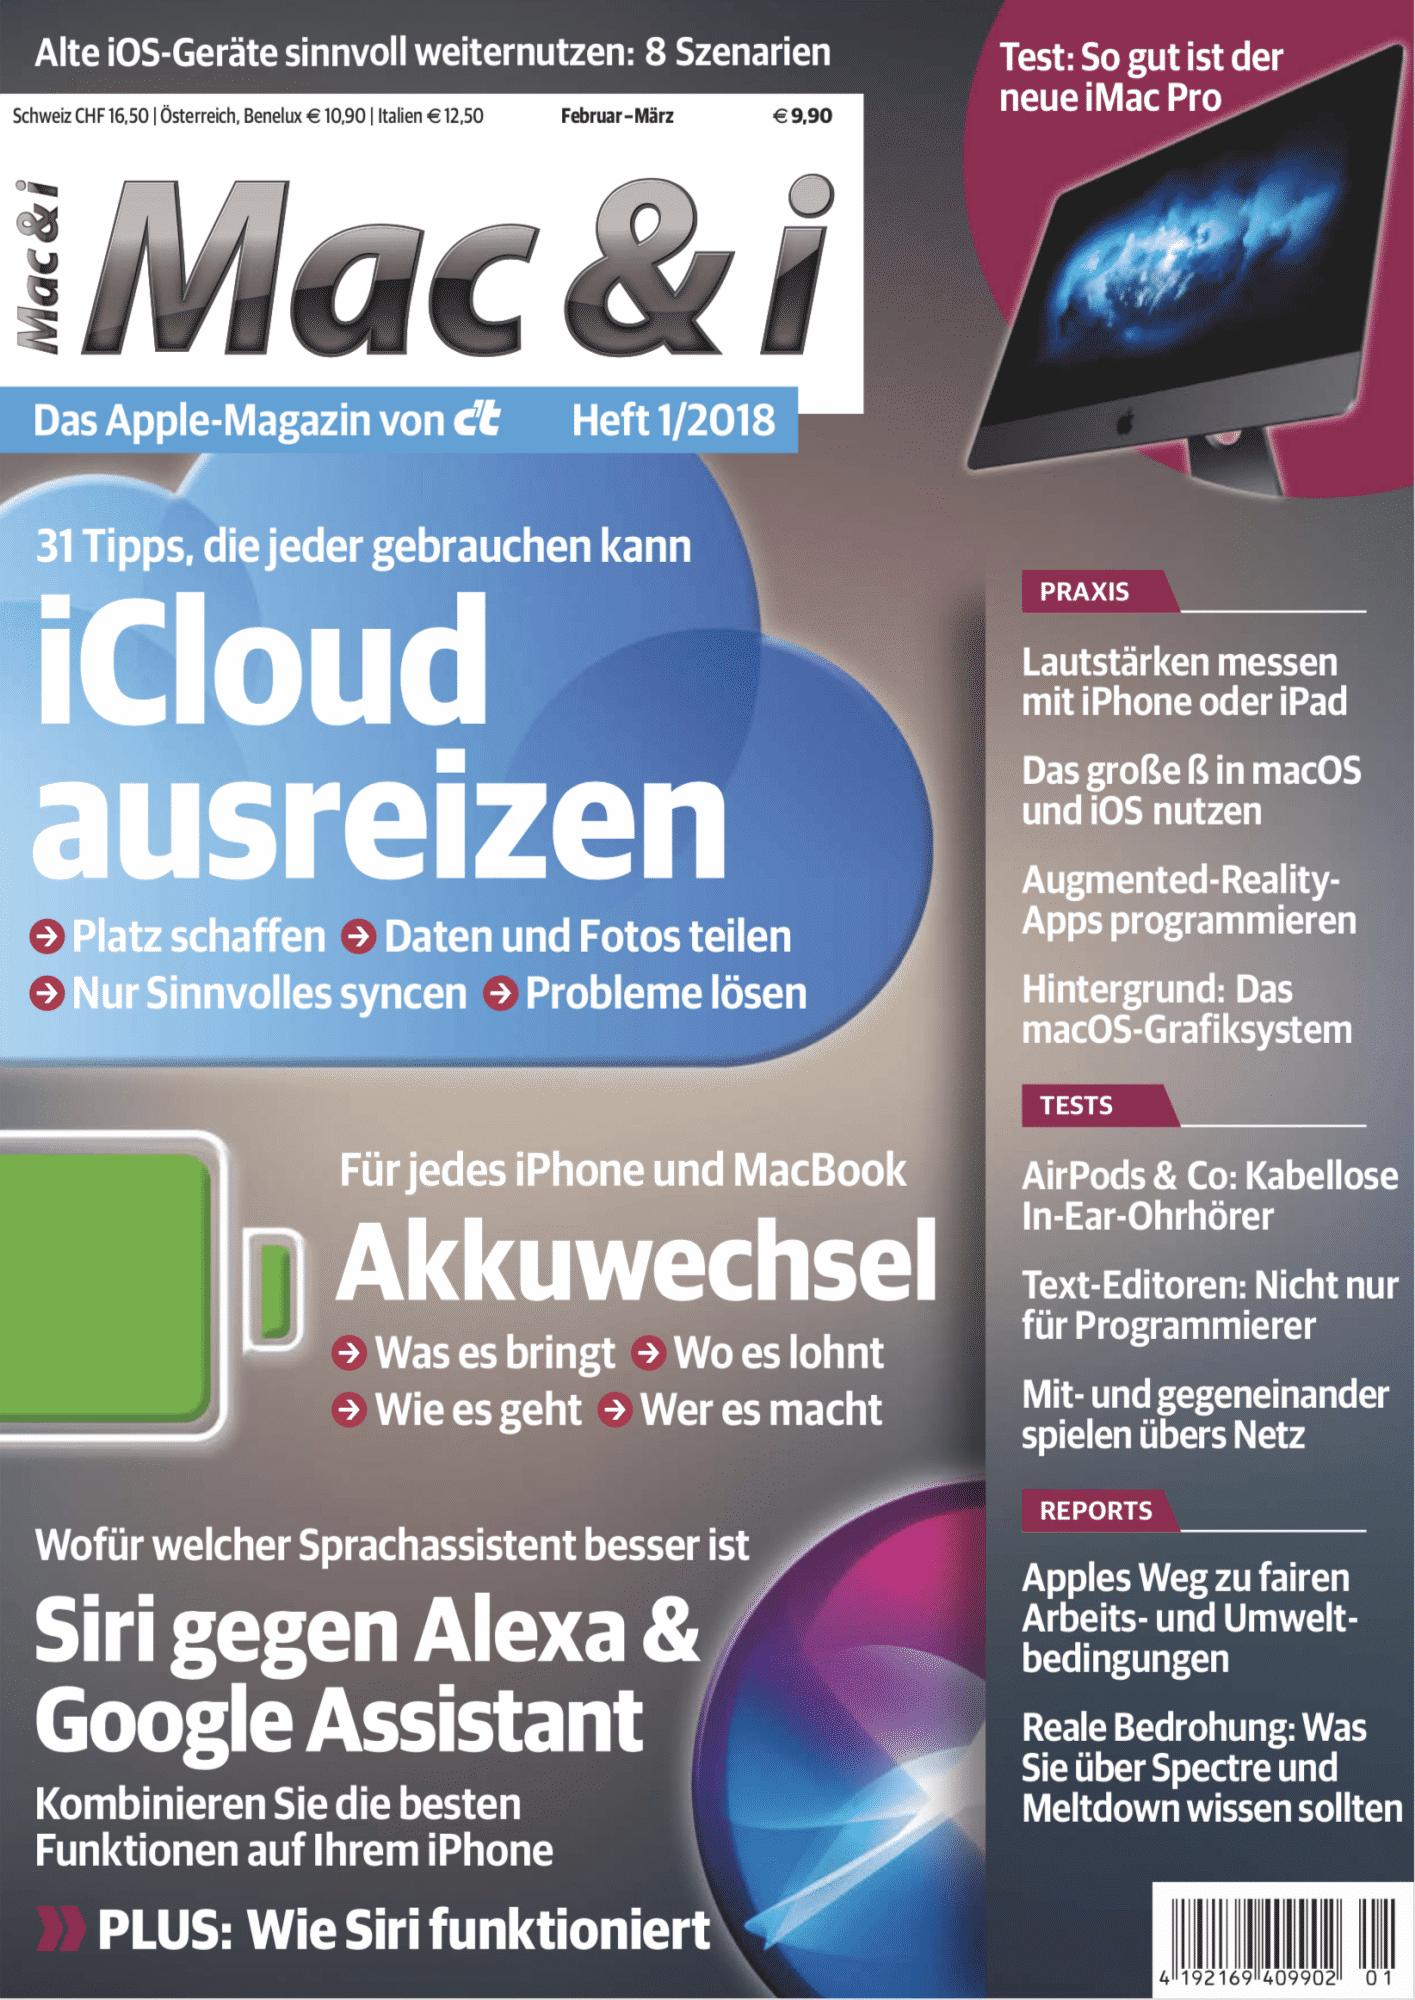 Mac & i Heft 1/2018: Titelbild …